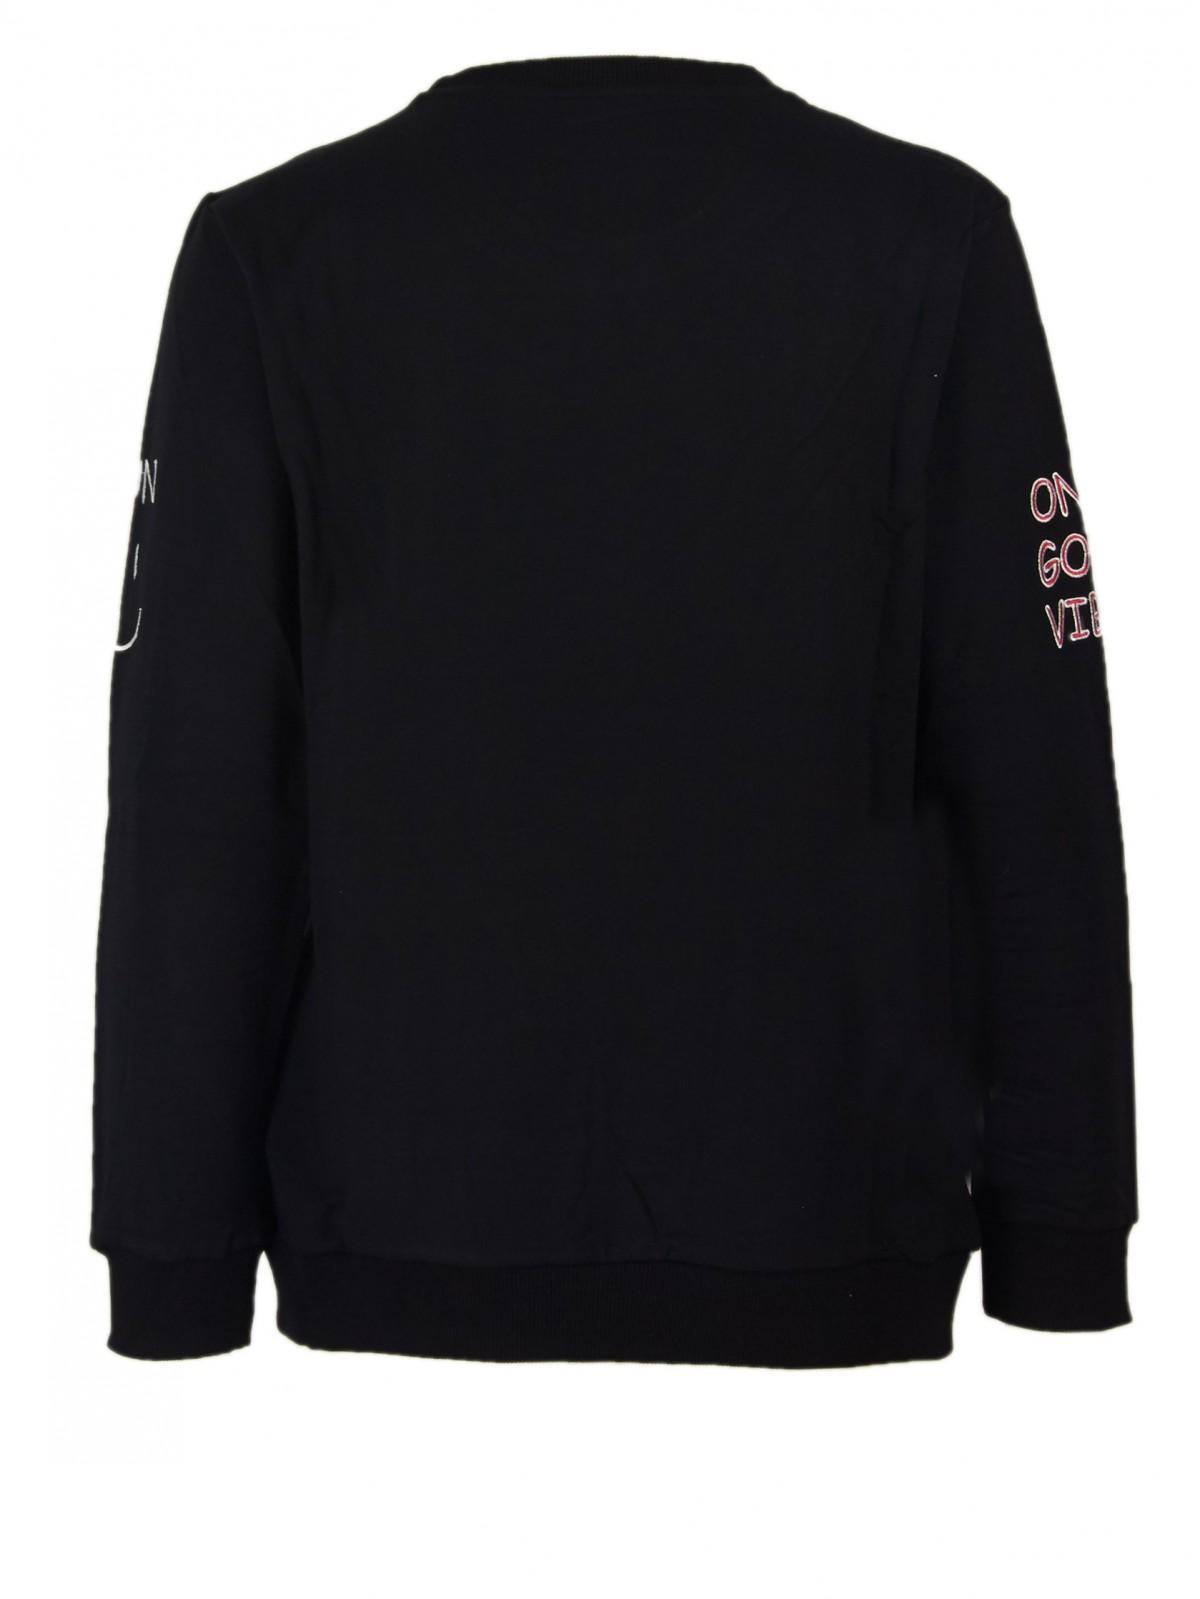 Angry Sylvester Sweatshirt